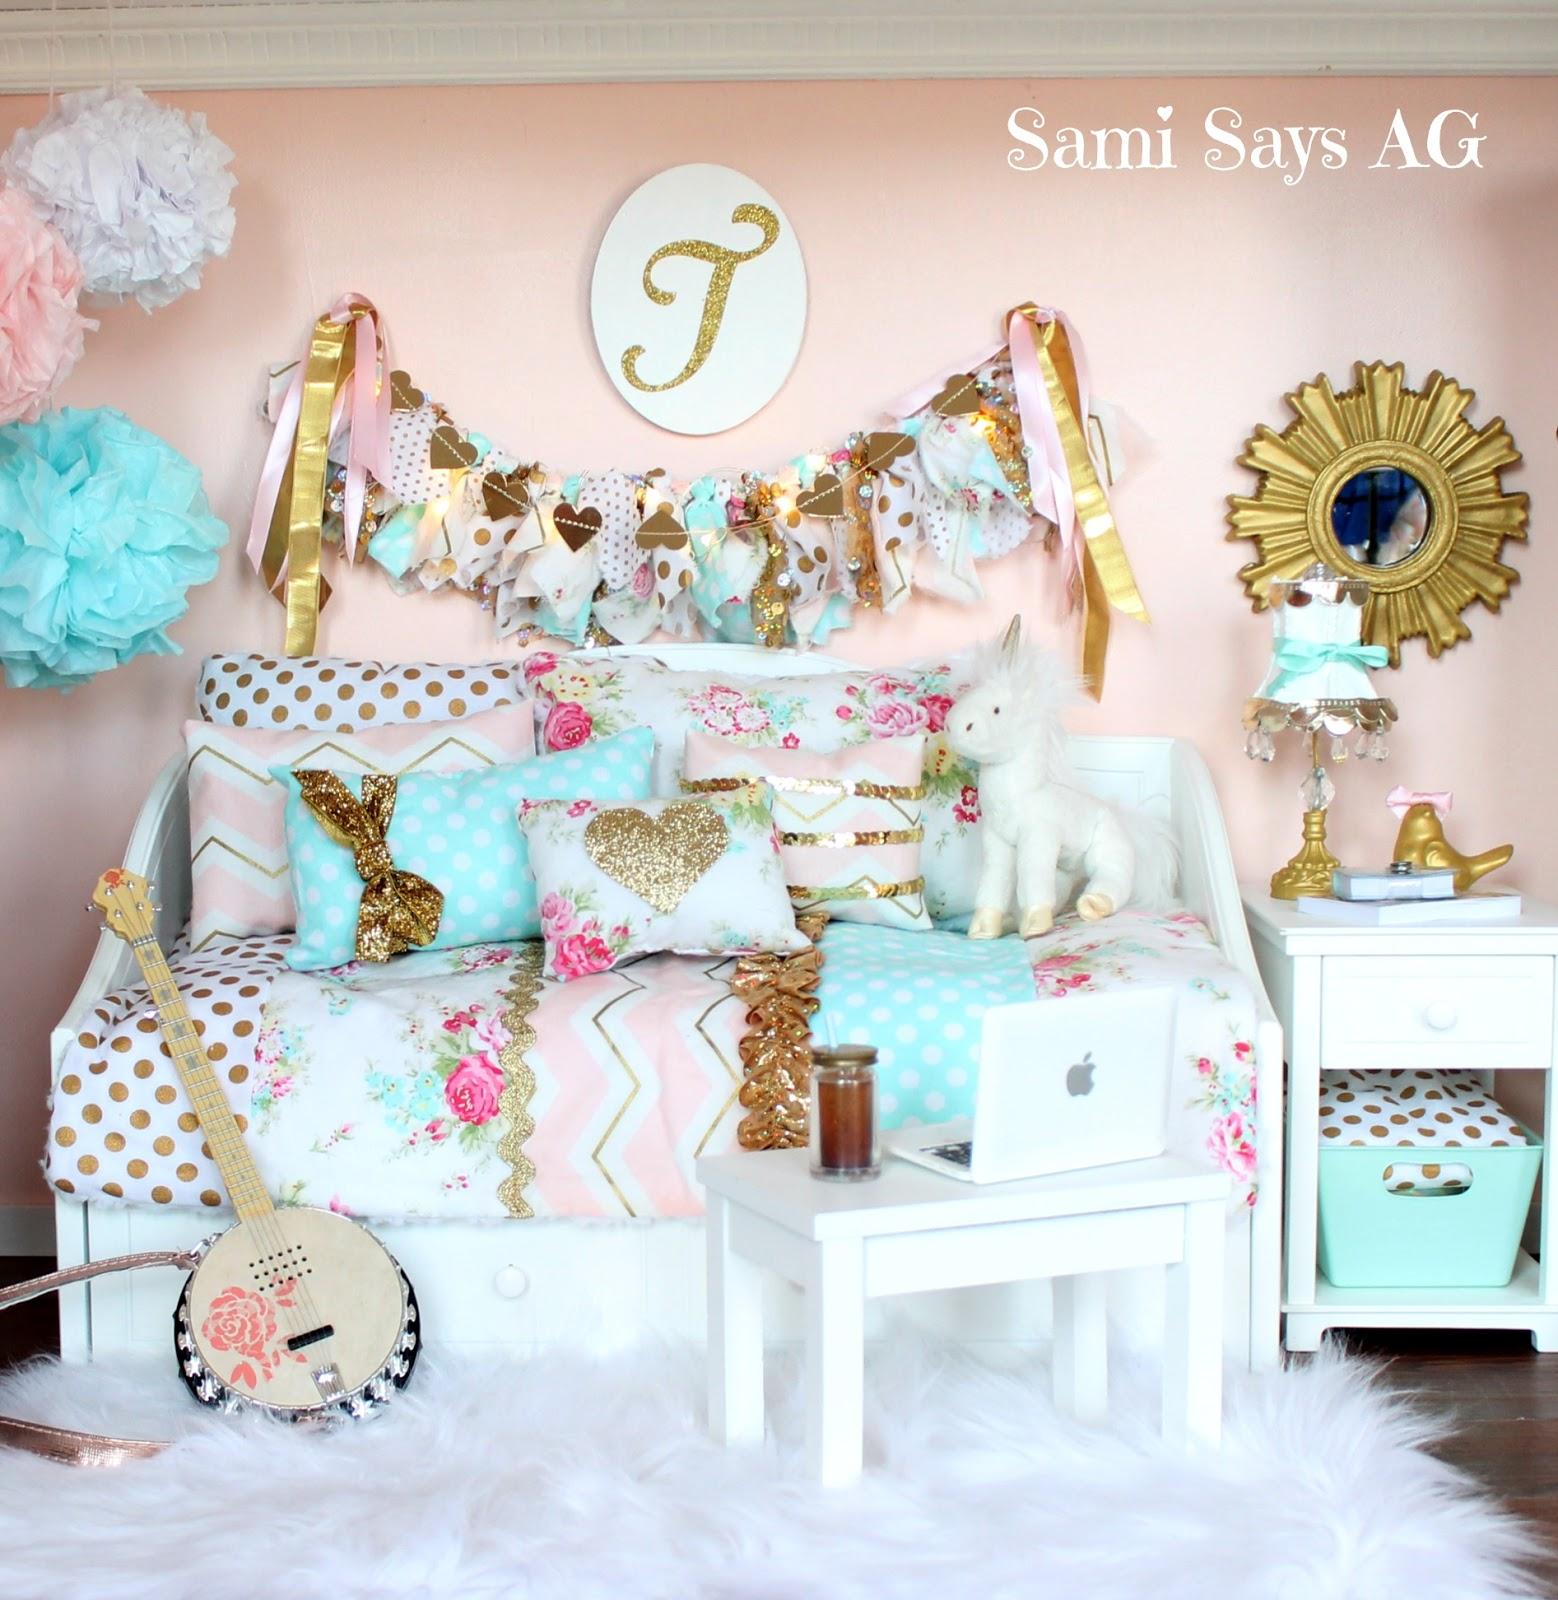 American Girl Doll Living Room Furniture: Sami Says AG: American Girl Tenney Grant's Doll House Room